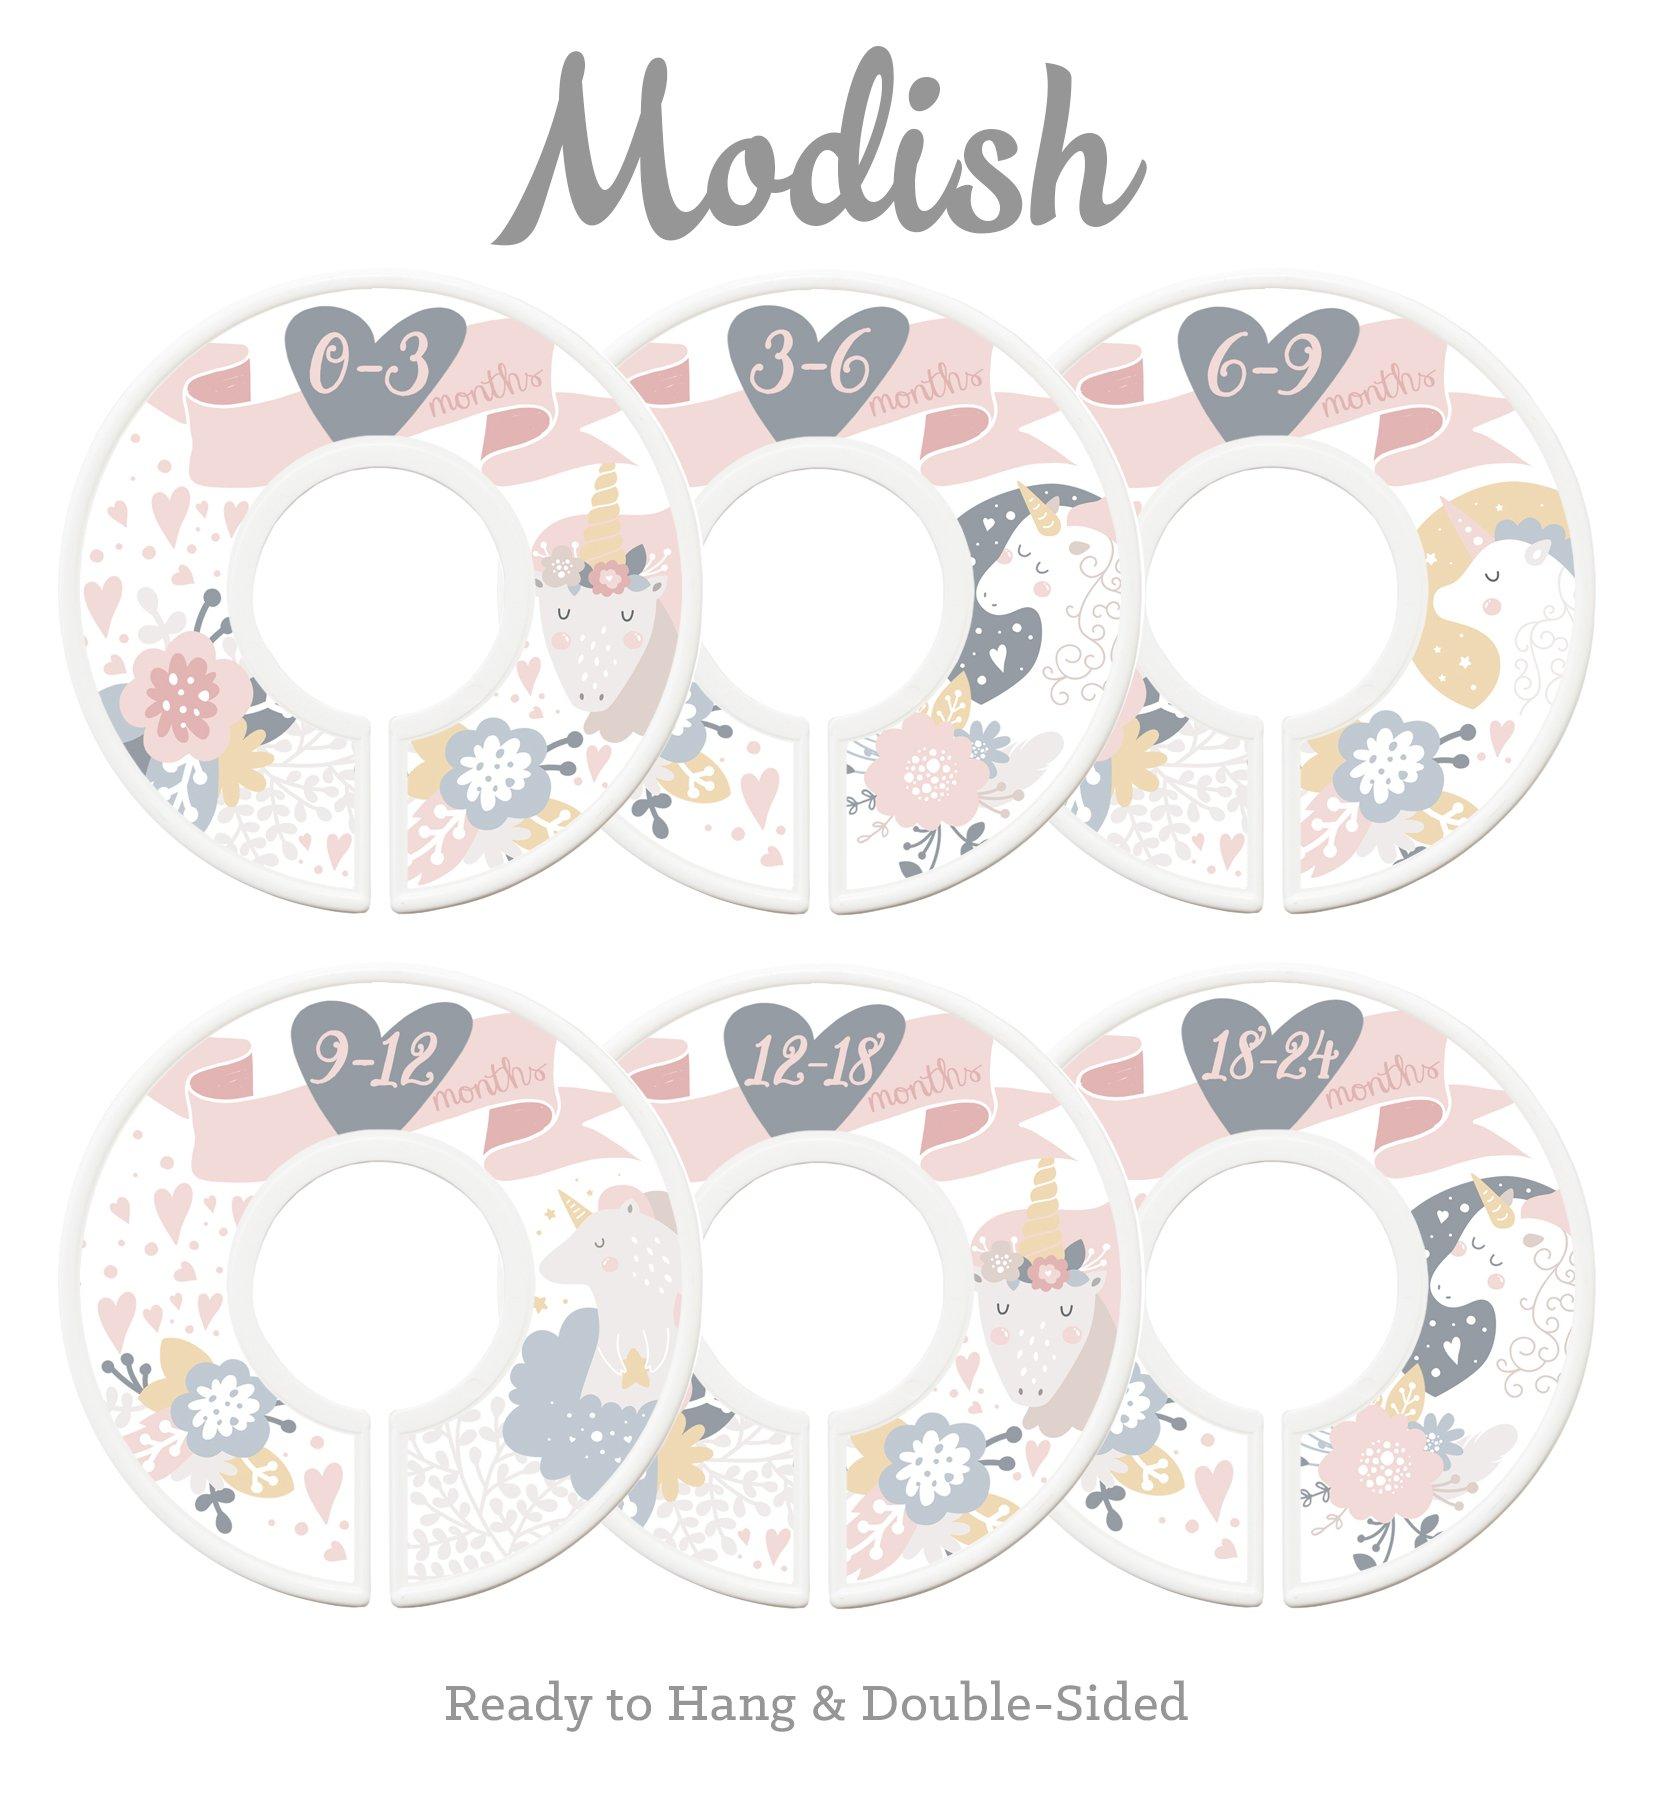 Modish Labels Baby Nursery Closet Dividers, Closet Organizers, Nursery Decor, Baby Girl, Pink, Gray, Grey, Gold, Floral, Unicorn